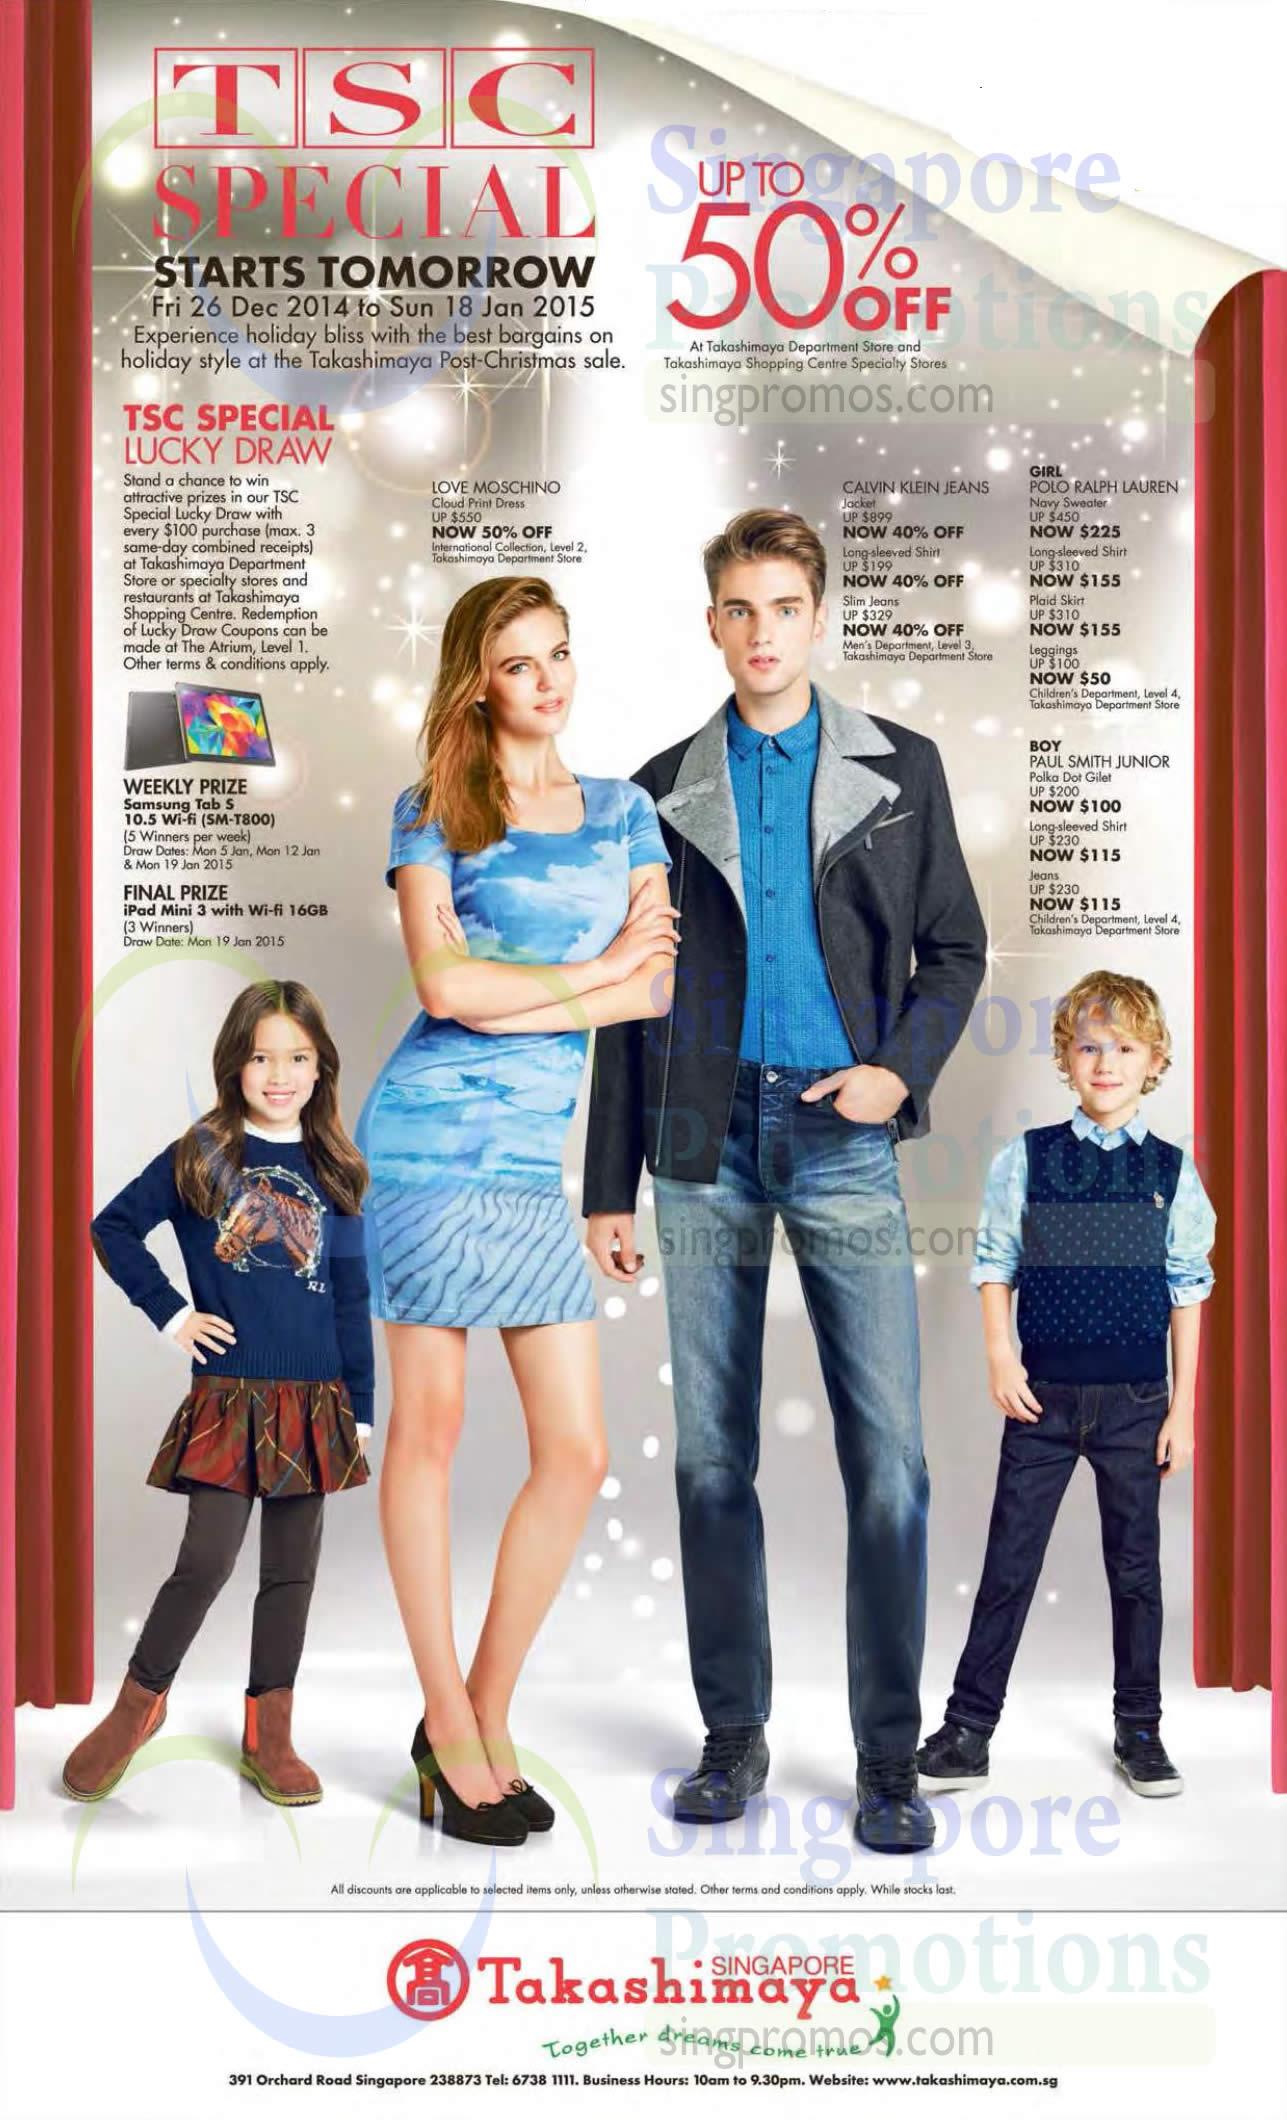 Shirts, Jeans, Jackets, Sweater, Leggings, Love Moschino, Calvin Klein Jeans, Polo Ralph Lauren, Paul Smith Junior